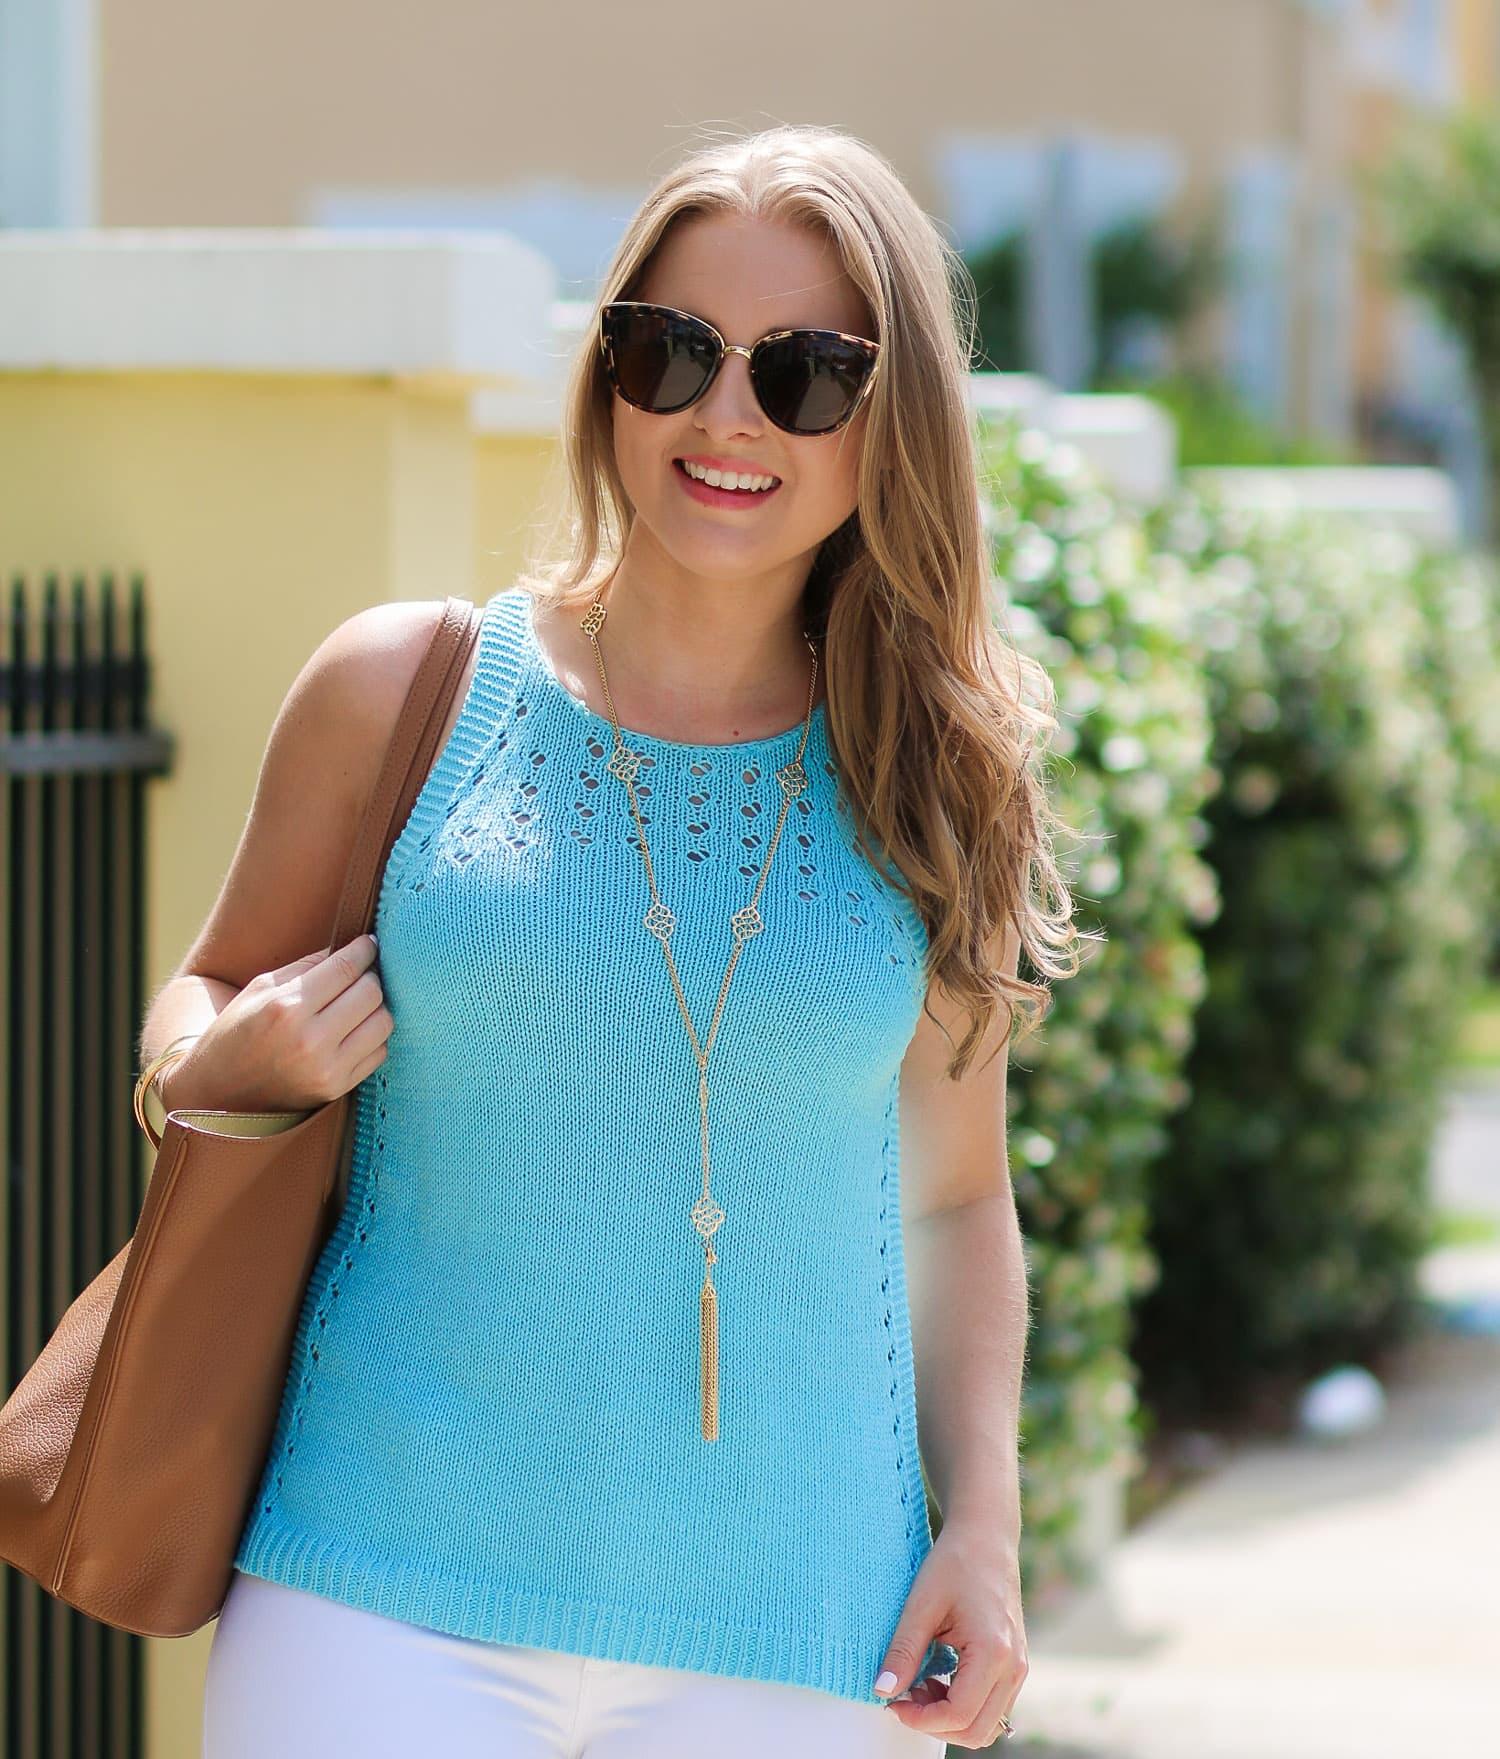 Lilly-Pulitzer-Mac-Sweater-Tank-Breakwater-Blue-Banana-republic-gold-lace-up-heels-fashion-blogger-ashley-brooke-nicholas-2996